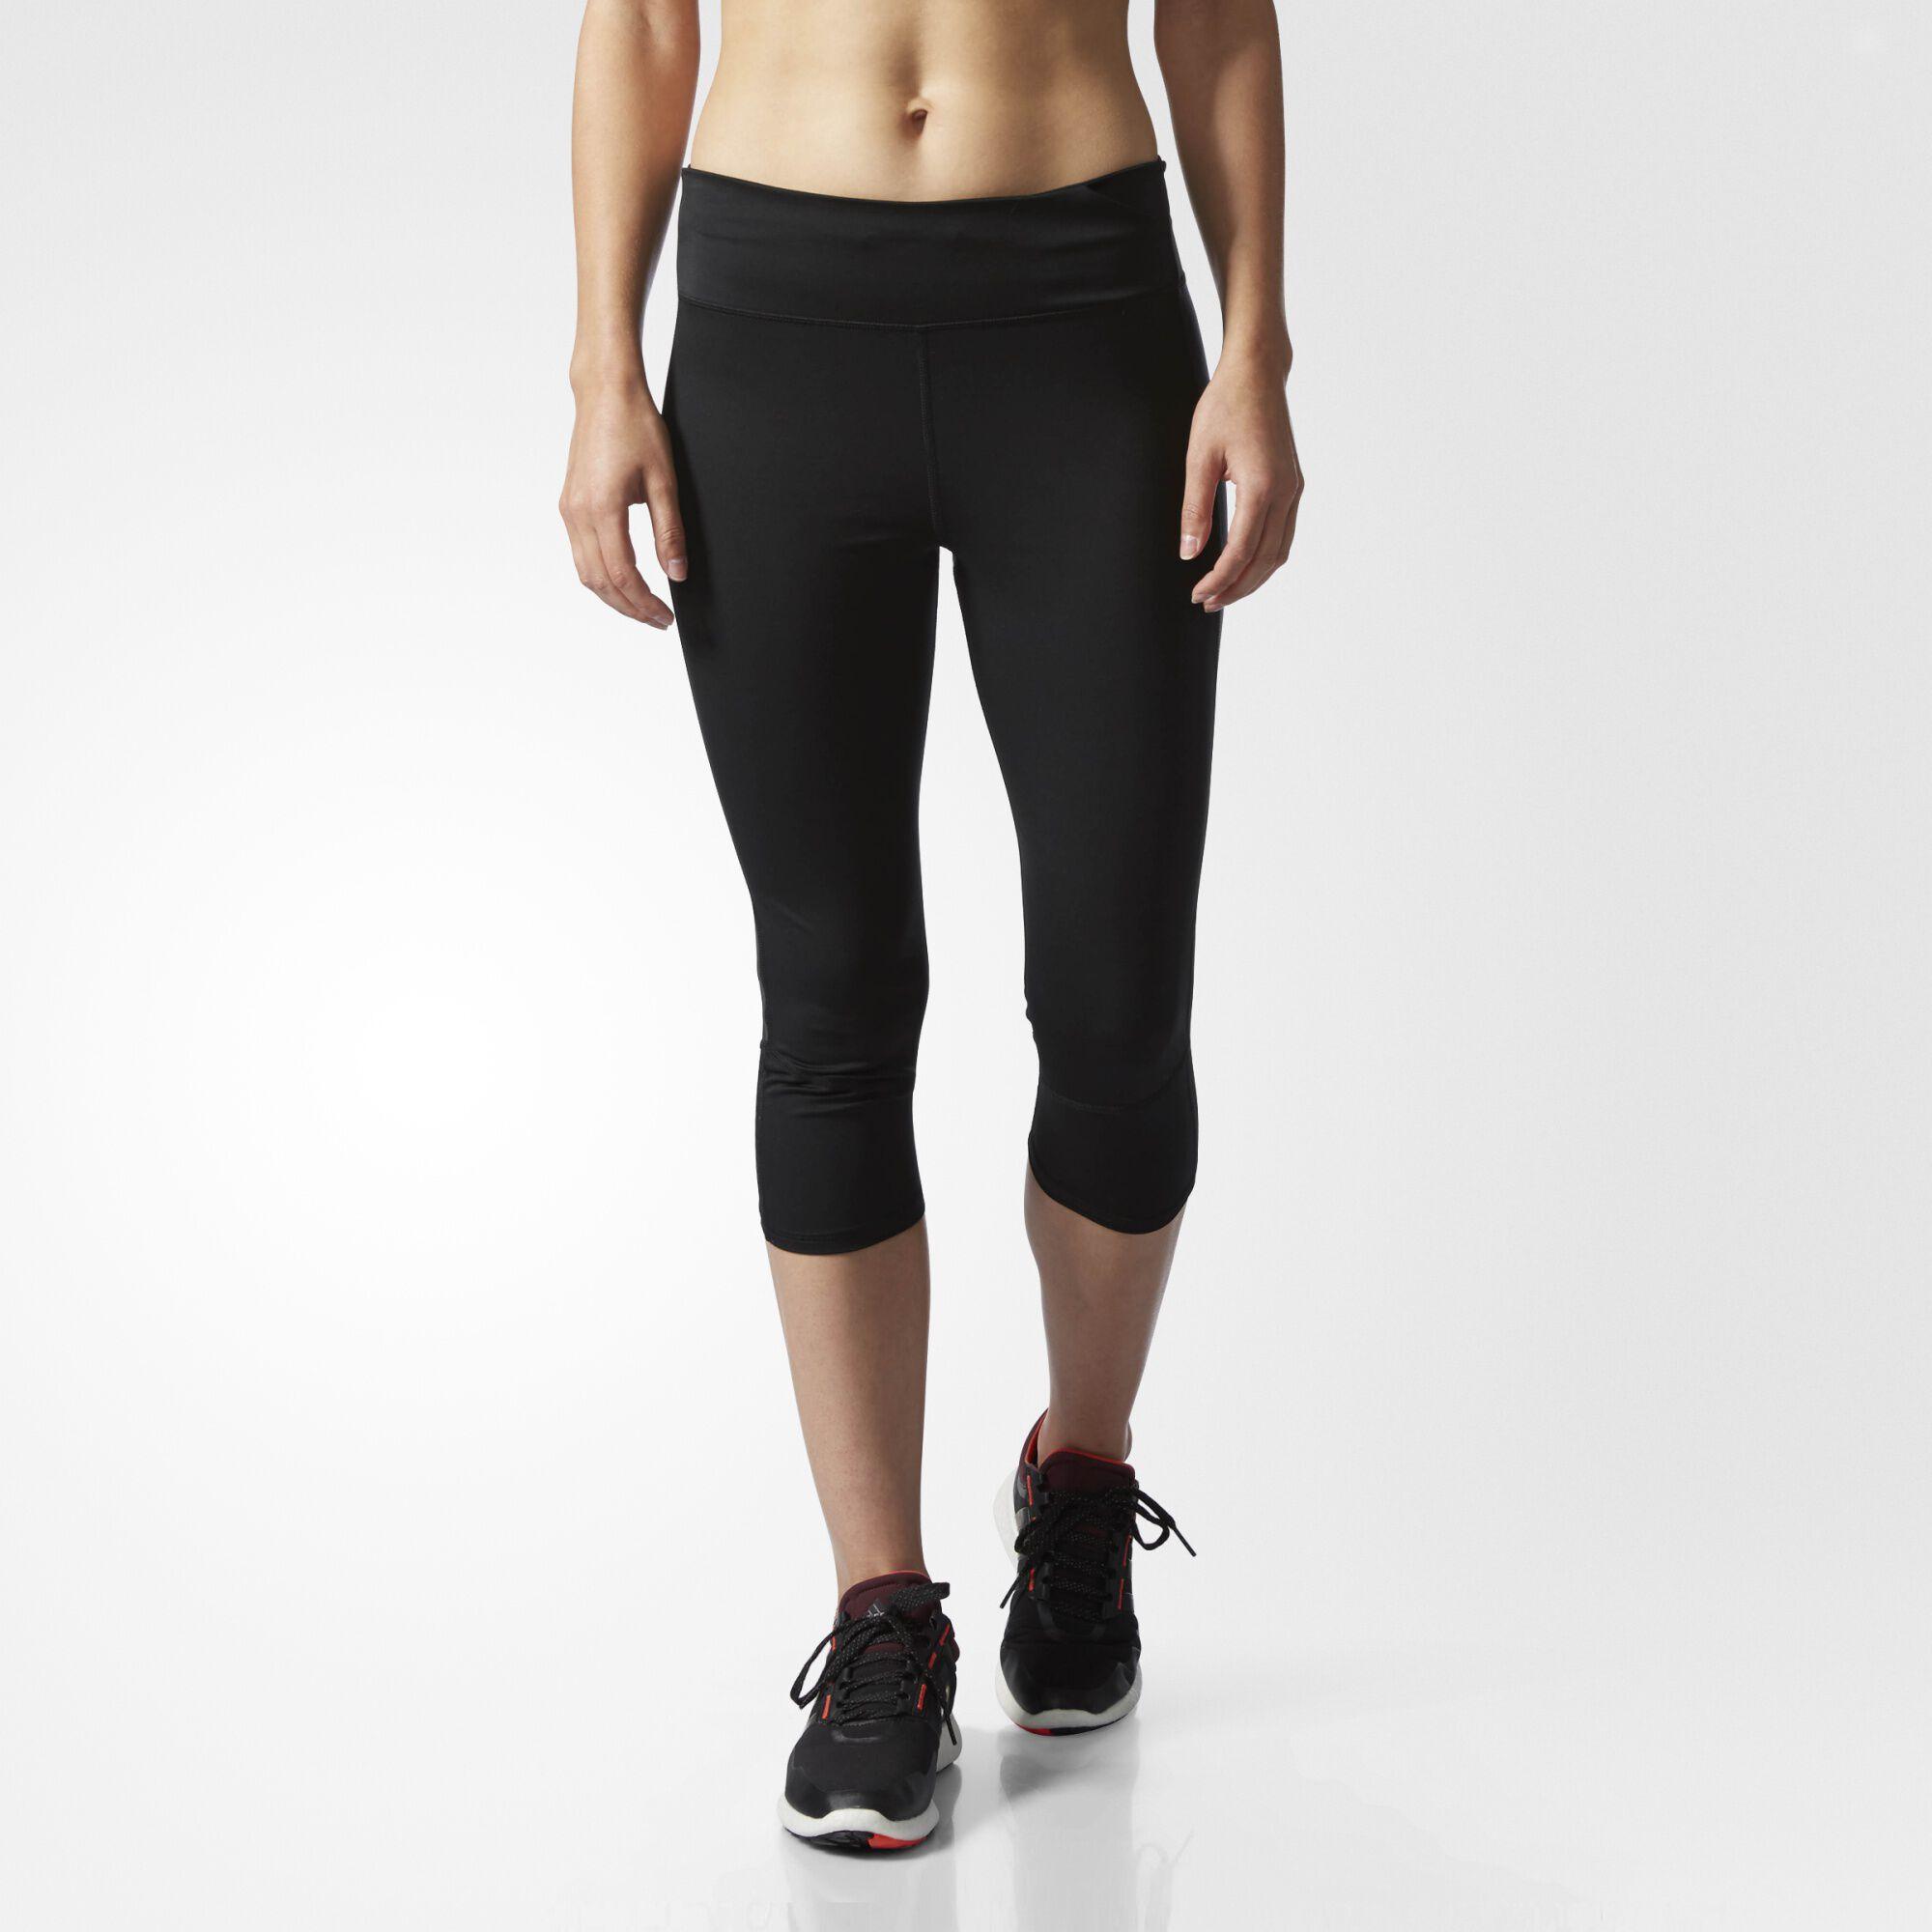 adidas - Supernova Three-Quarter Tights Black S97978. Women Running